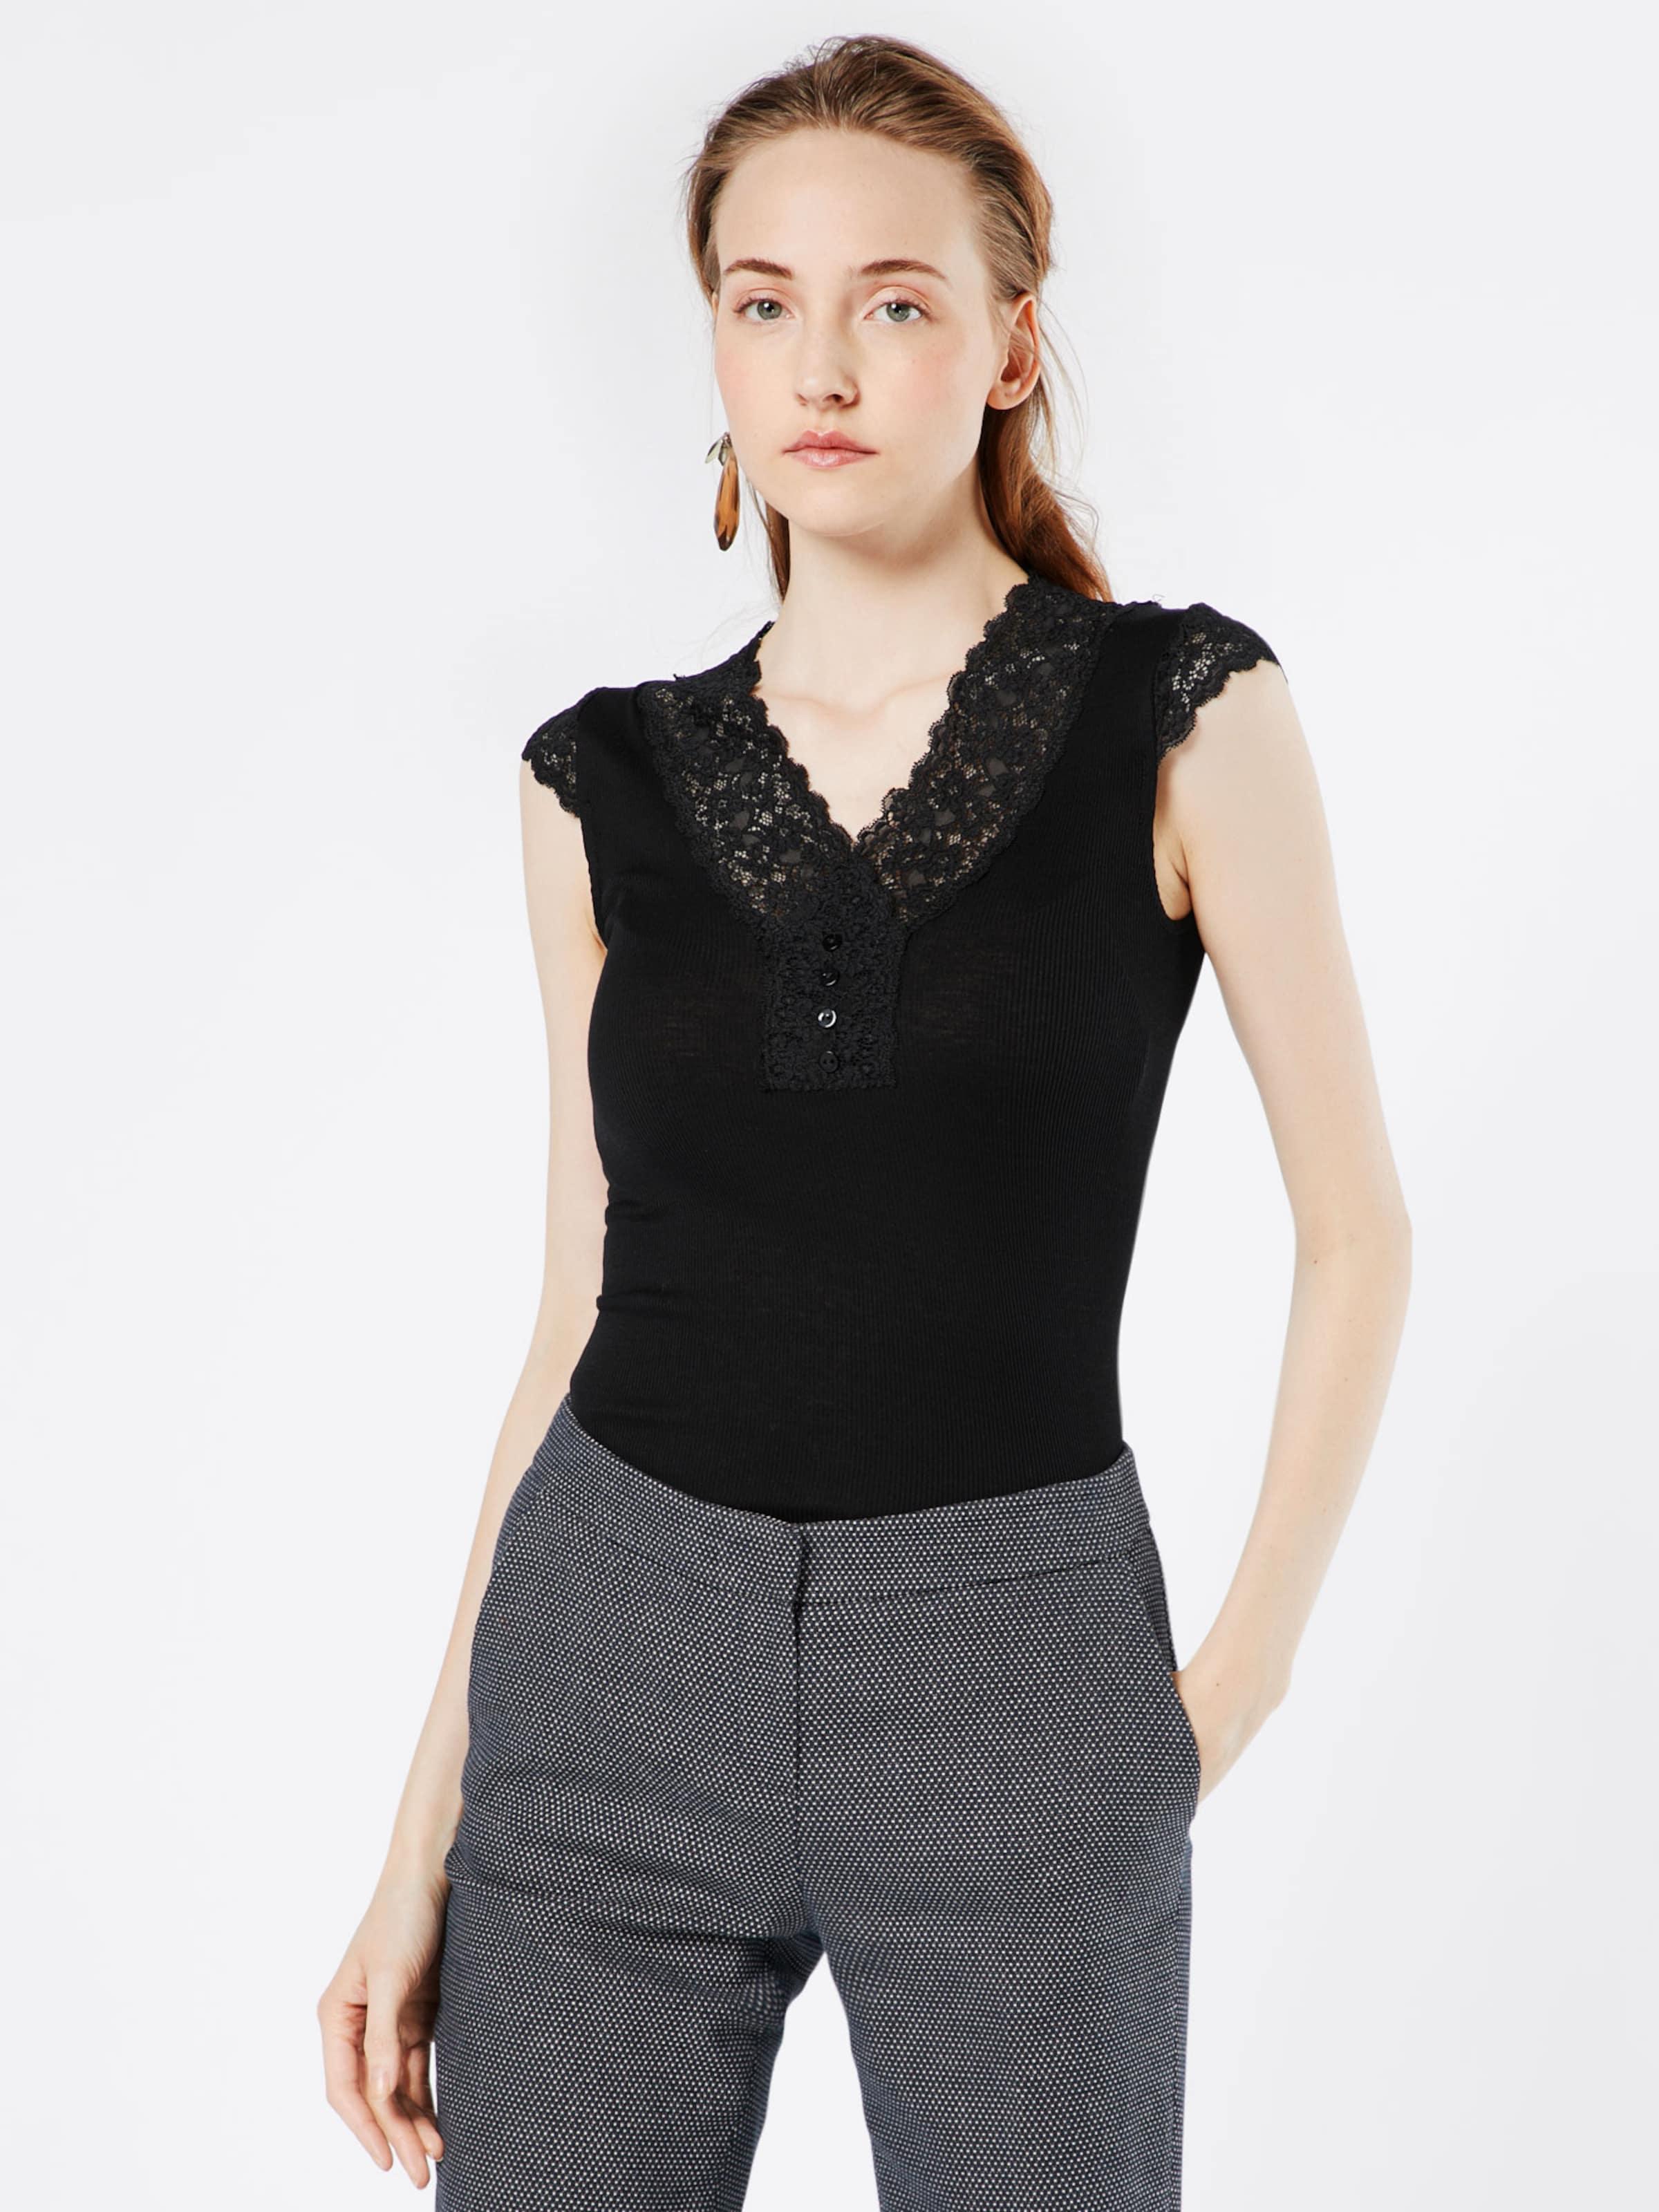 Shirt rosemunde rosemunde Shirt 'Silk' 'Silk' Shirt rosemunde rosemunde Shirt 'Silk' RYx5Snw5q